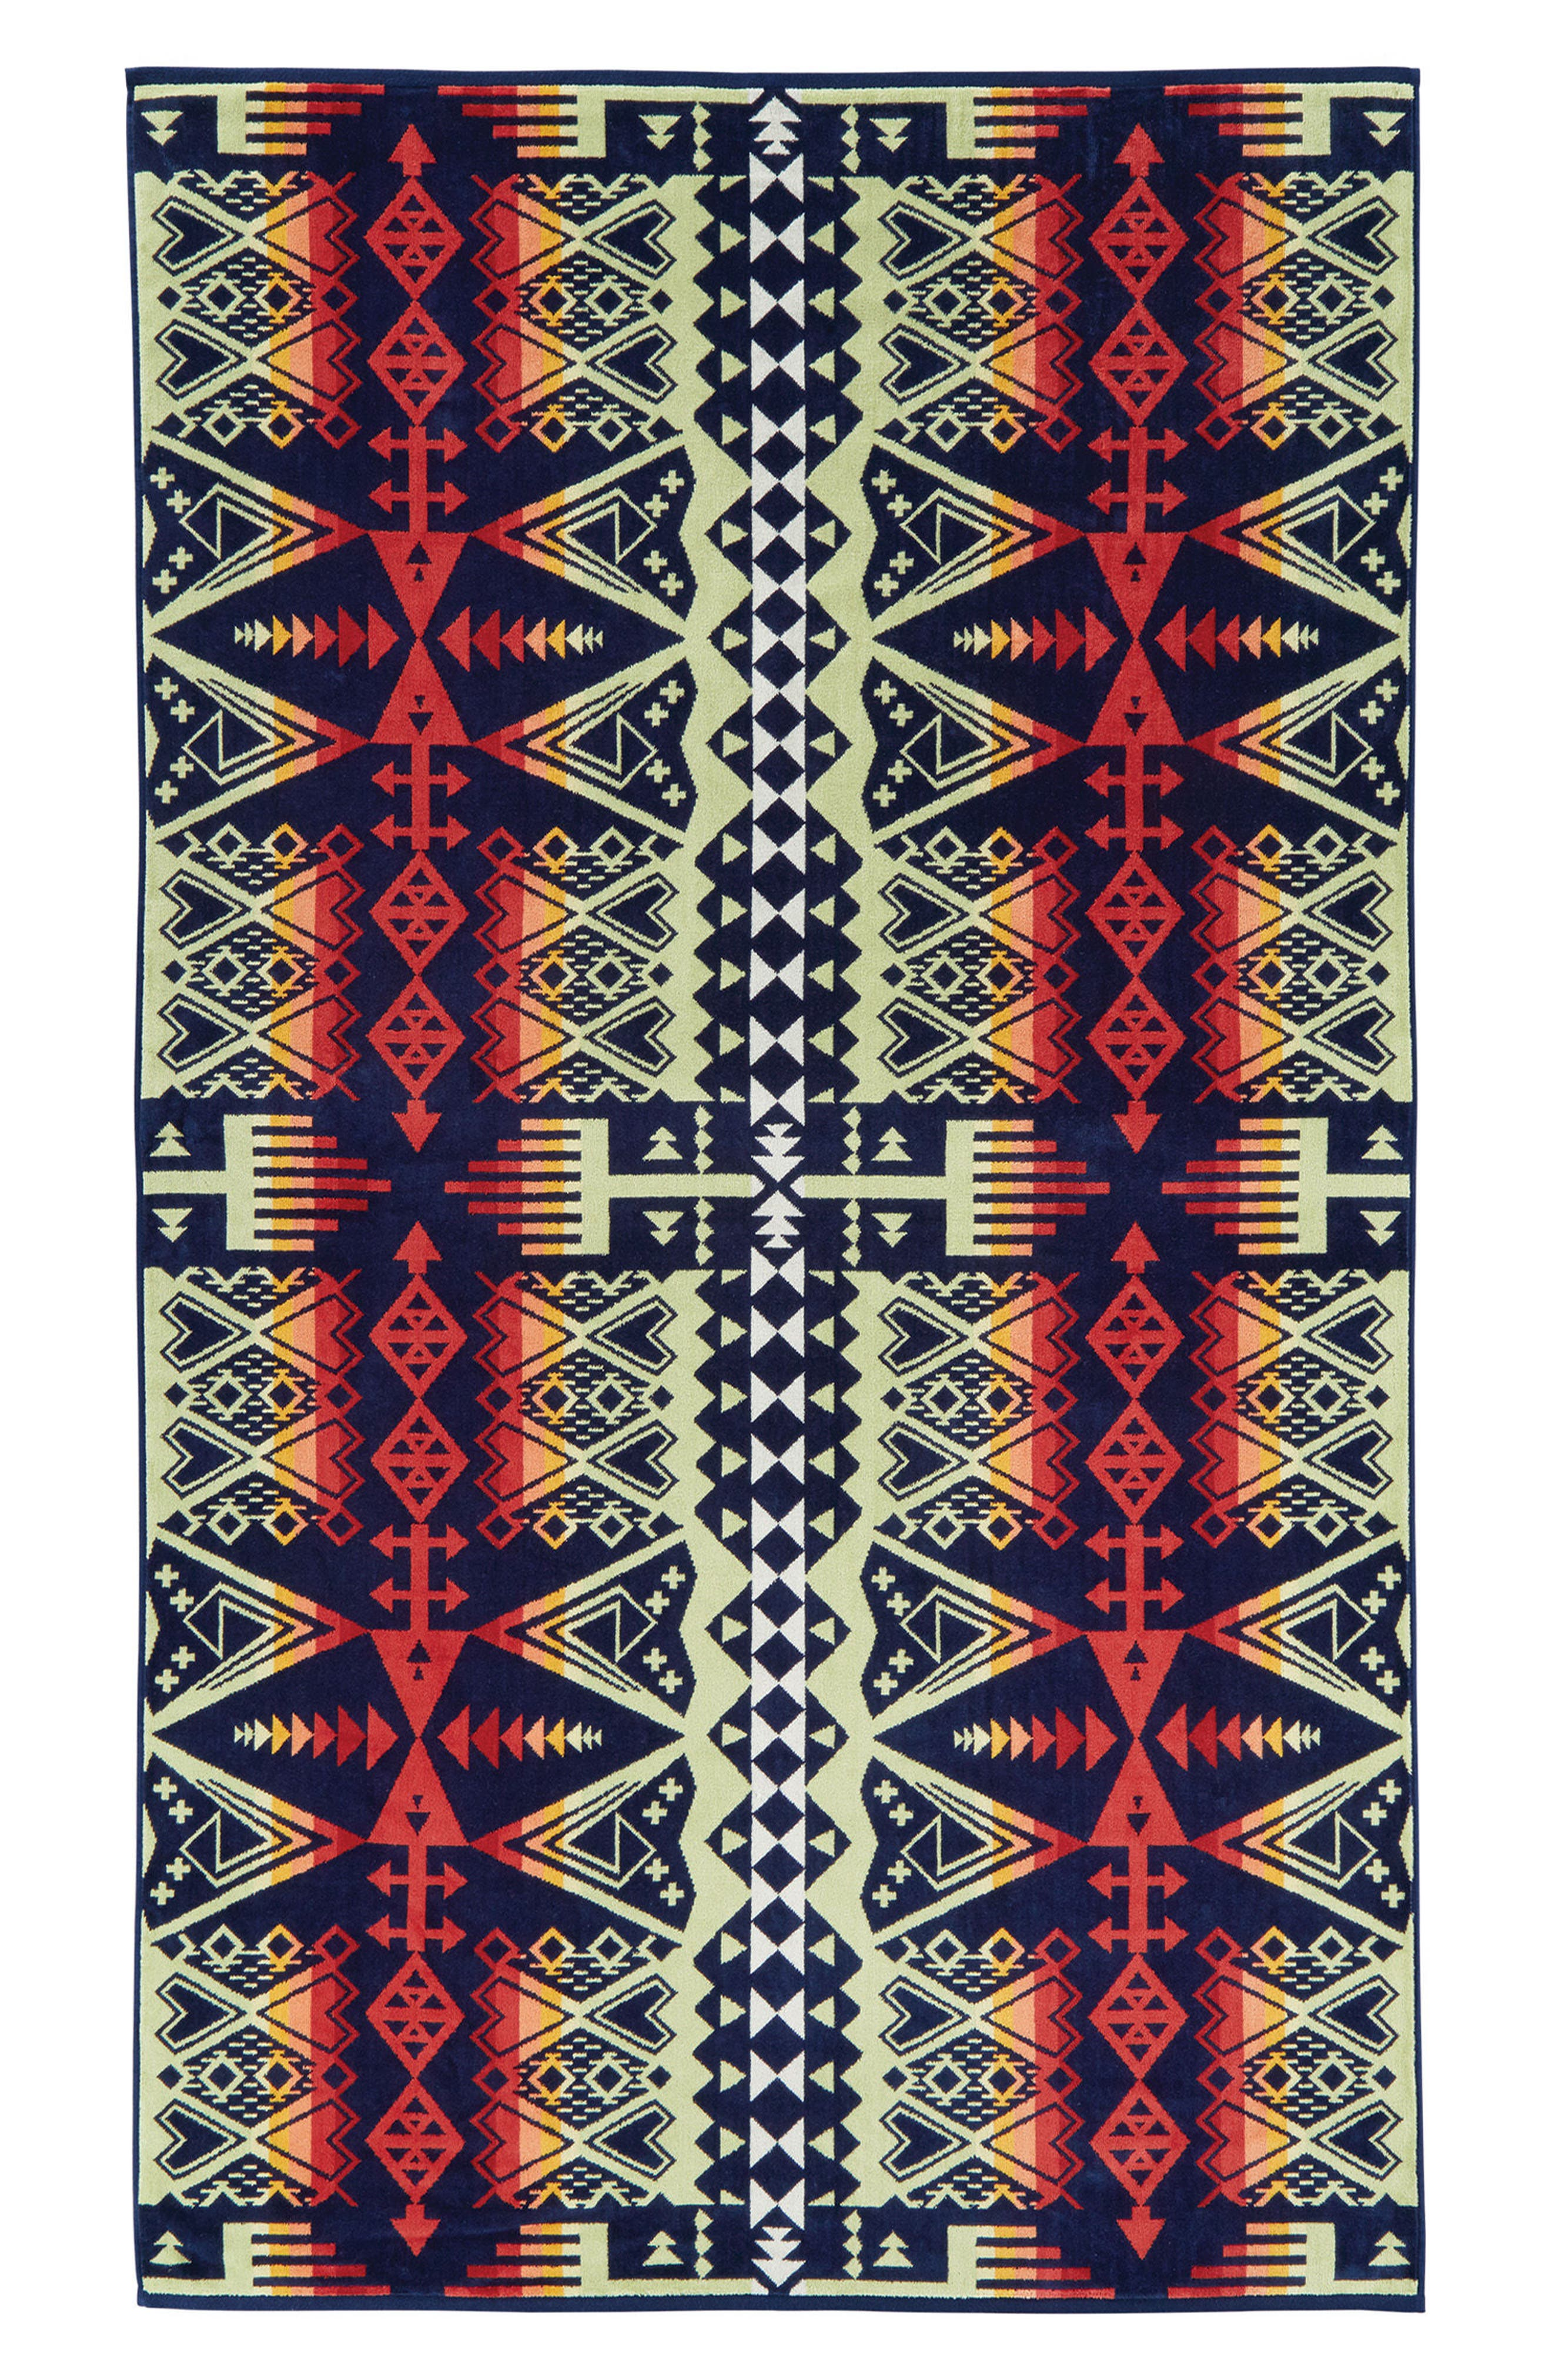 Pendleton Arrow Revival Jacquard Towel